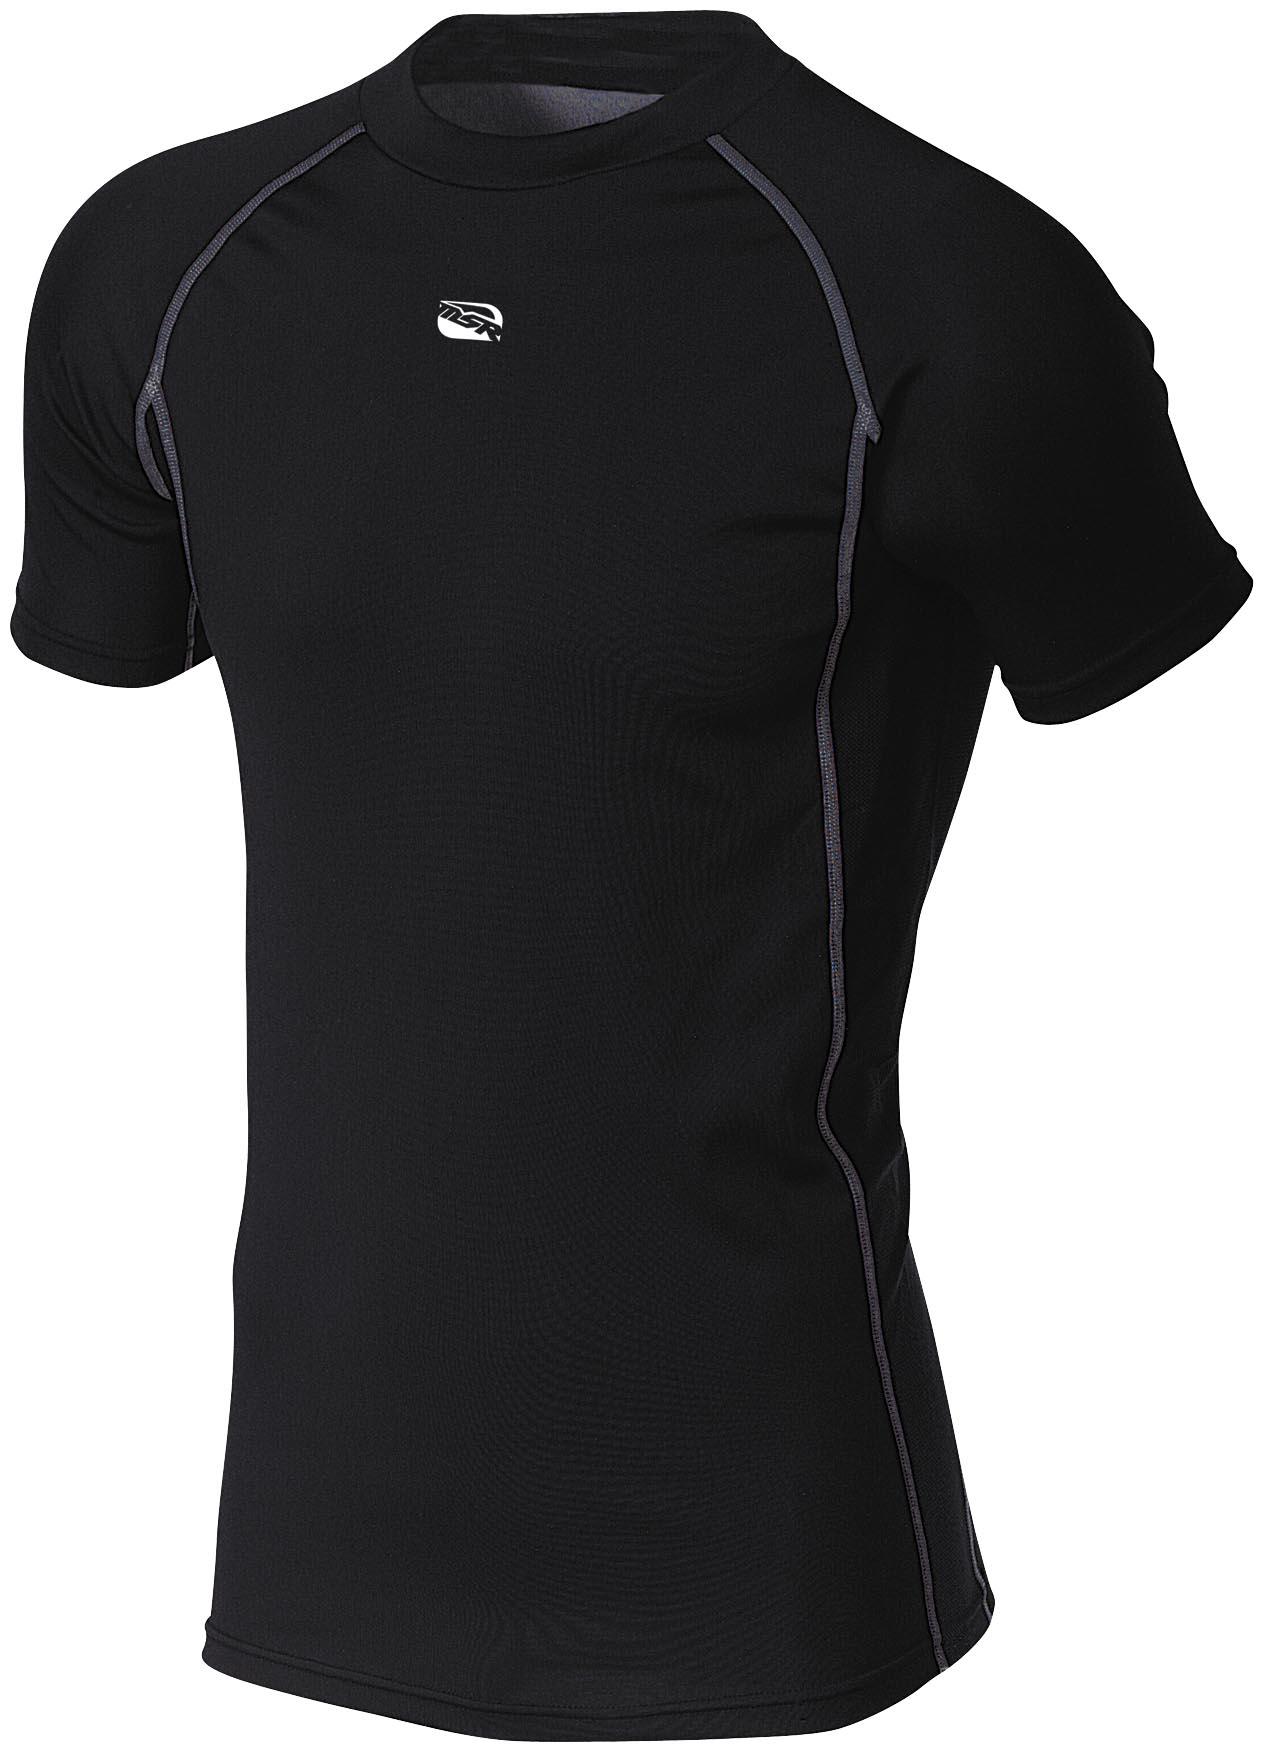 Base Layer Short Sleeve Shirt